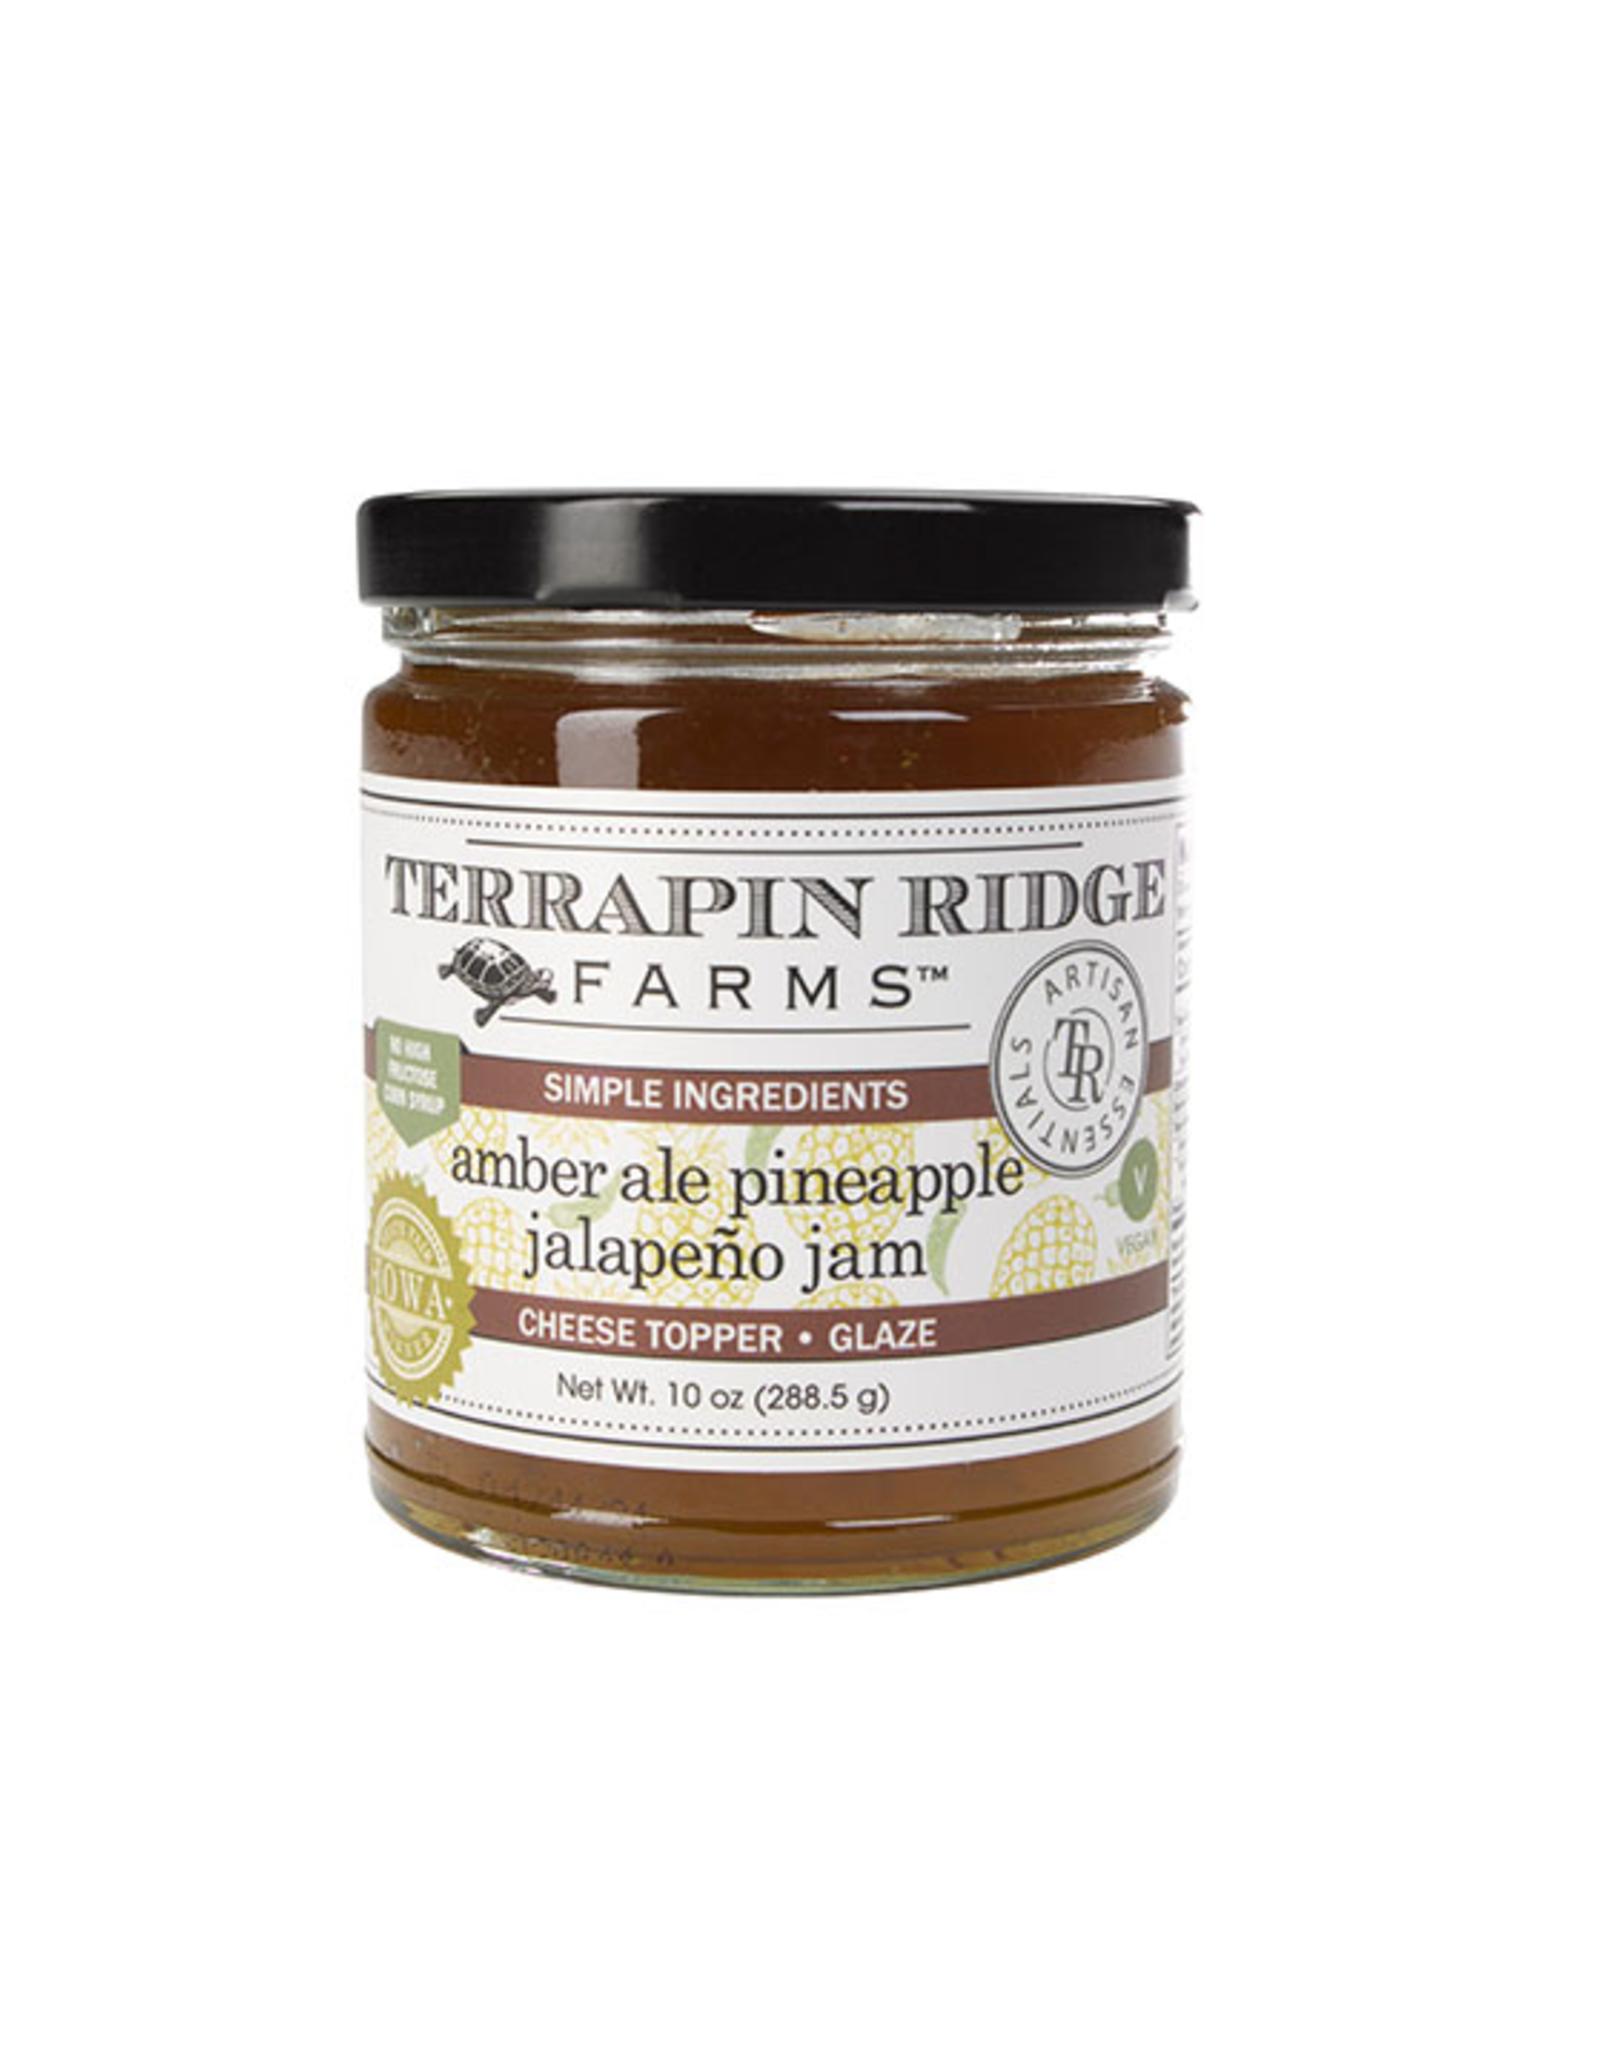 Terrapin Ridge Amber Ale Pineapple Jalapeno Jam